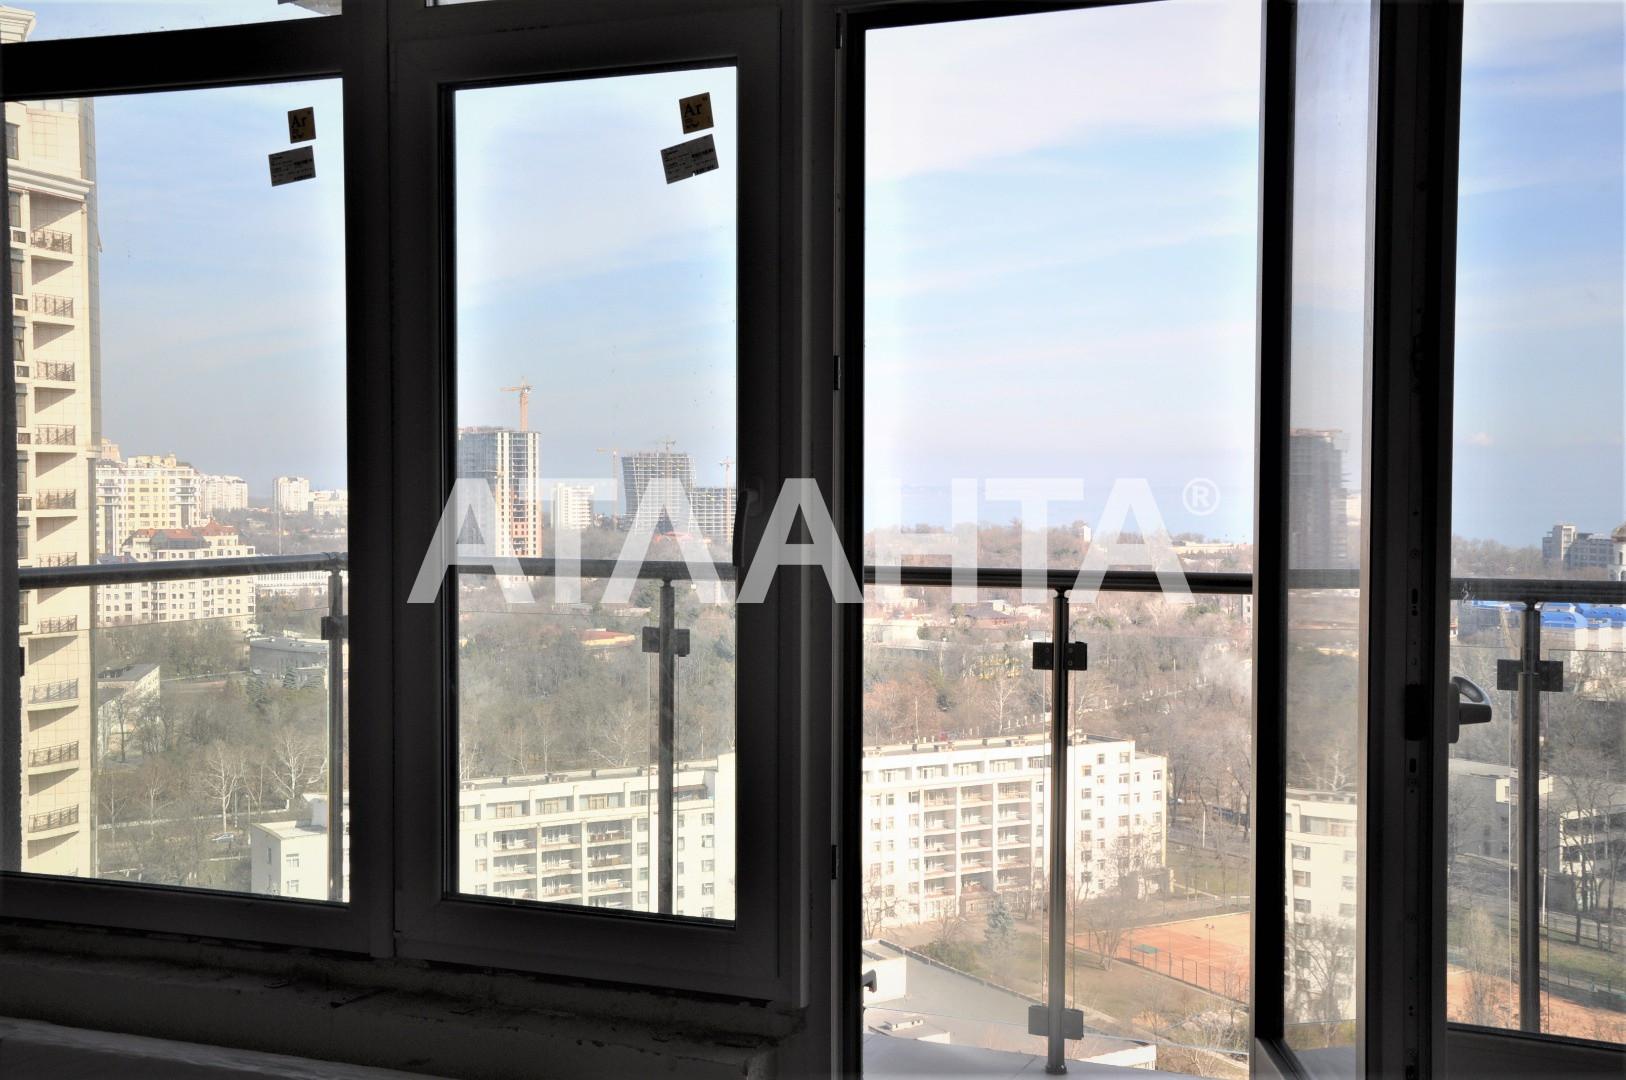 Продается 1-комнатная Квартира на ул. Генуэзская — 55 800 у.е. (фото №12)